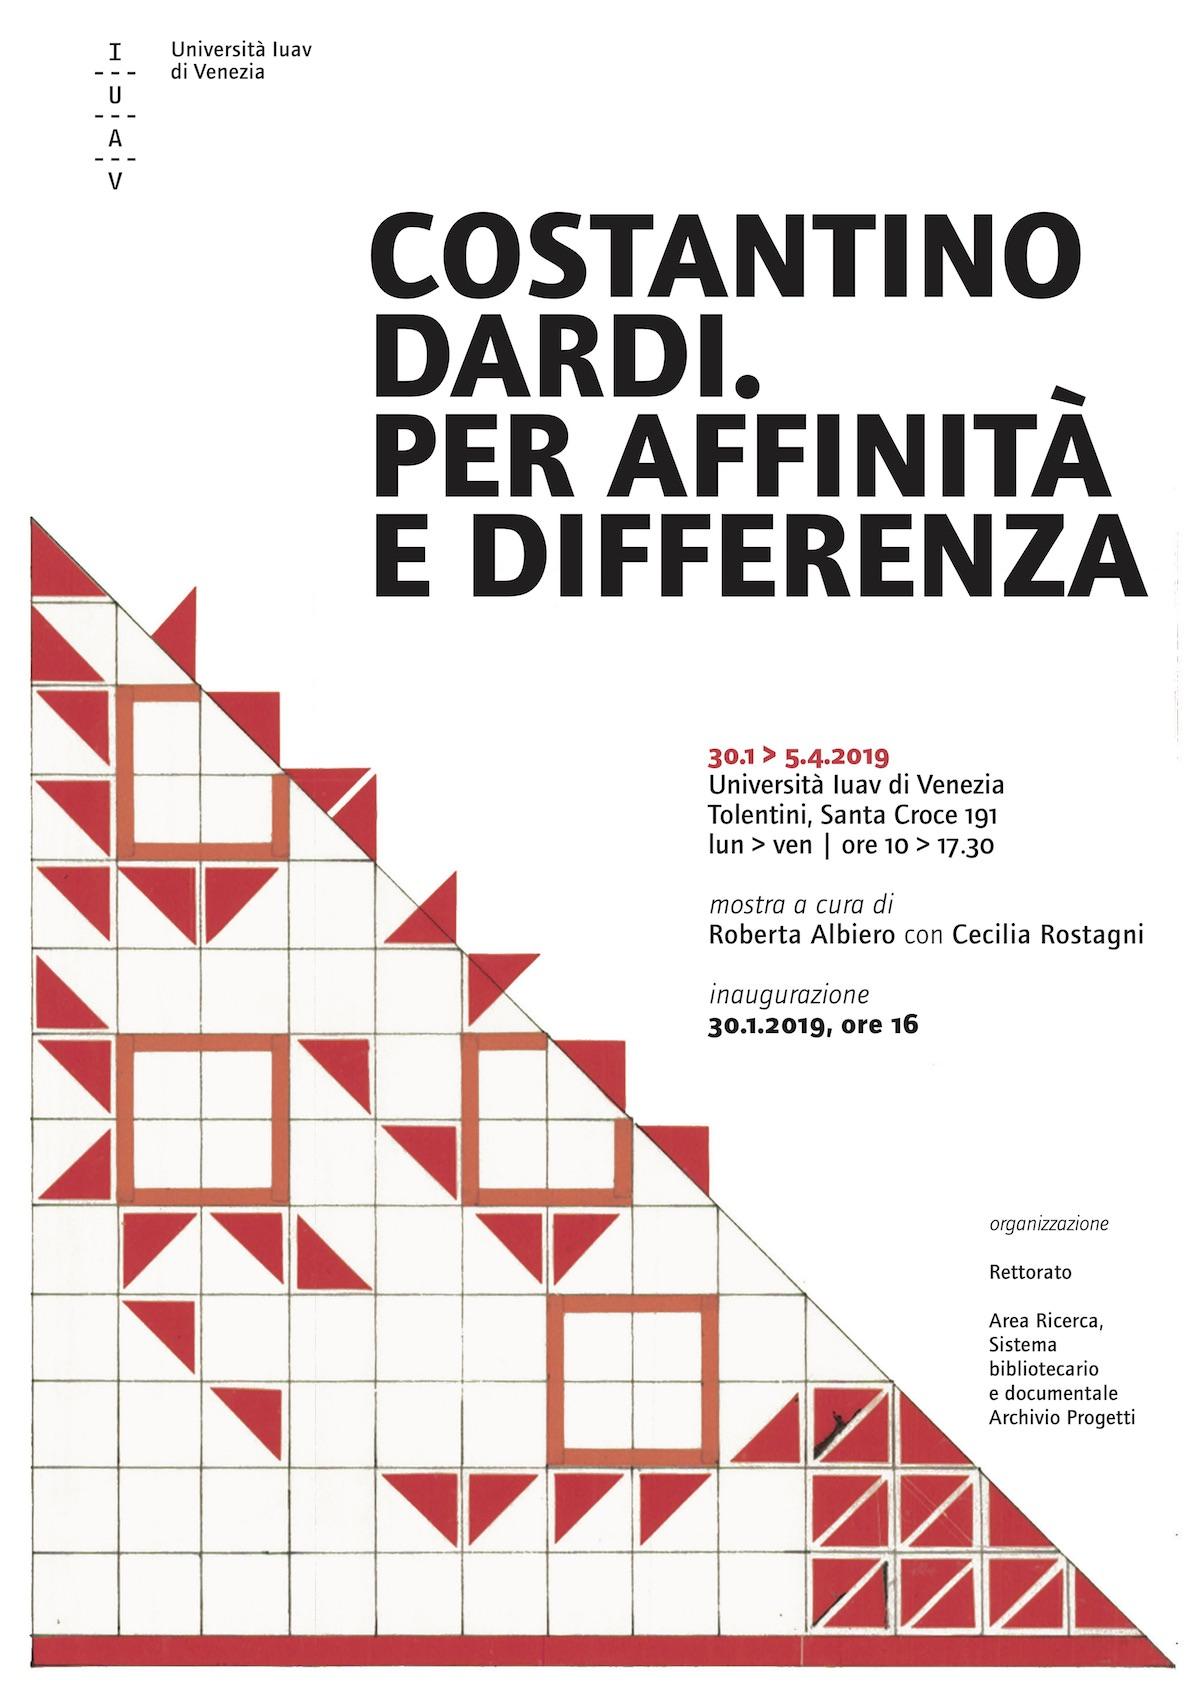 Costantino Dardi